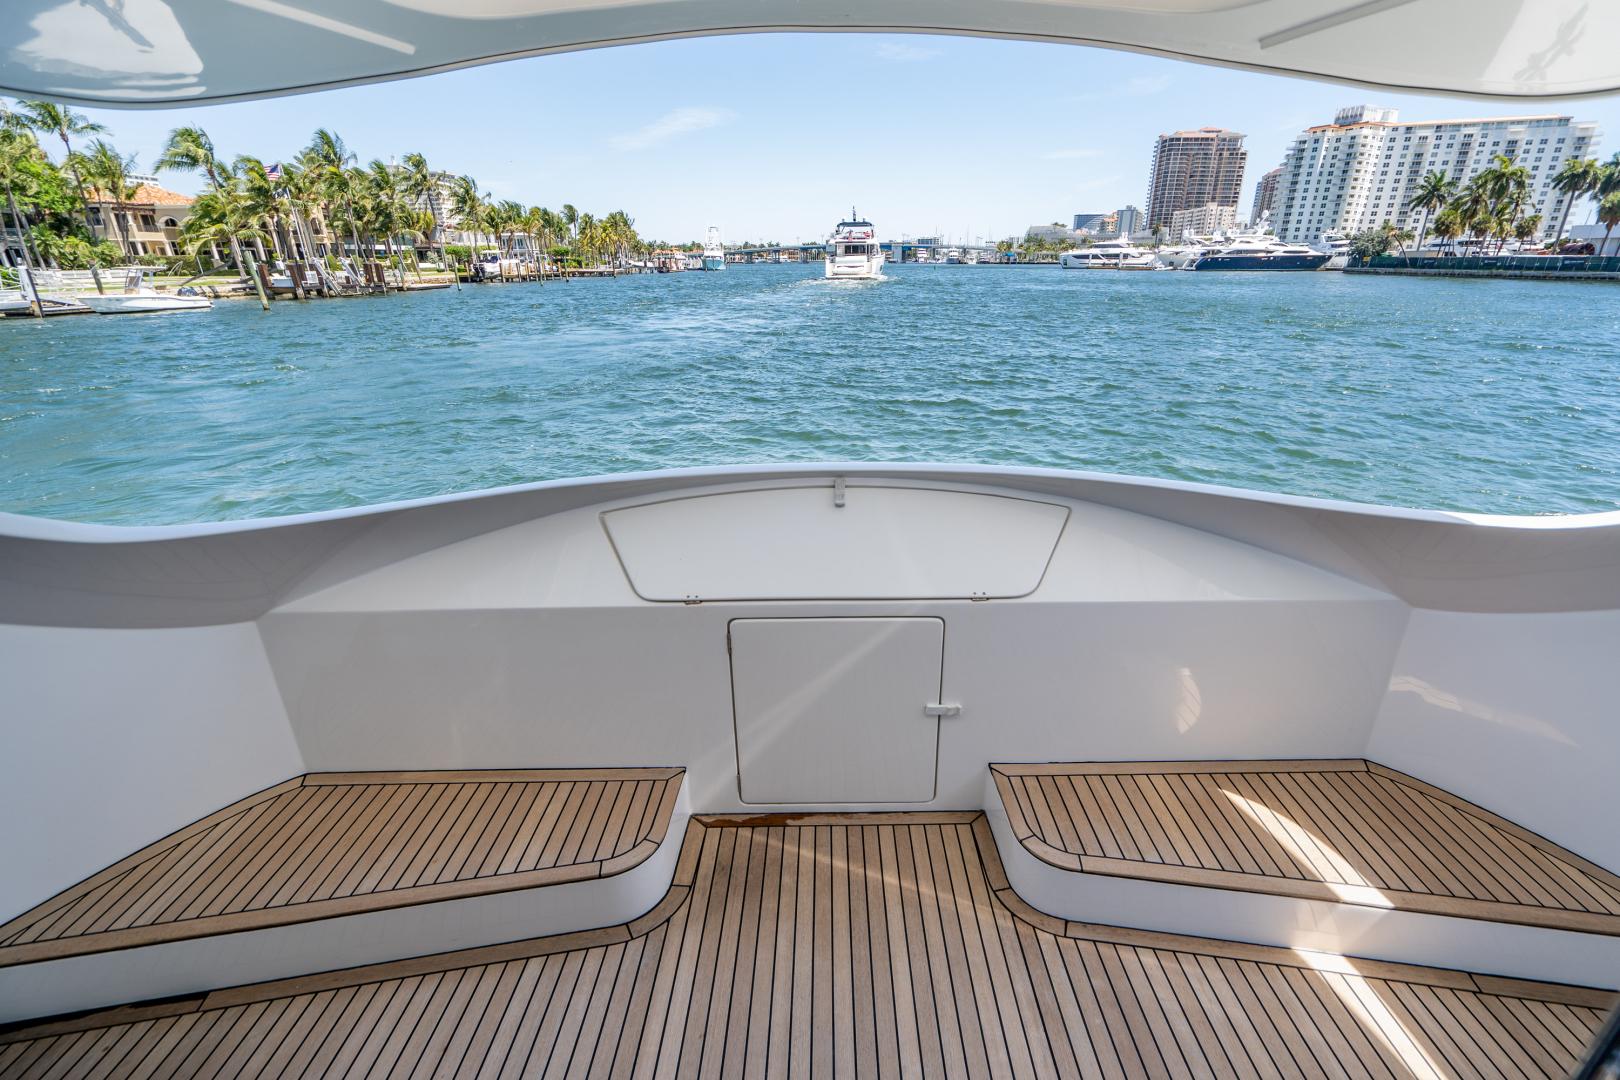 Overblue-58 Power Catamaran 2017-Techuila Ft. Lauderdale-Florida-United States-2017 Overblue 58 Powercat-1401179   Thumbnail